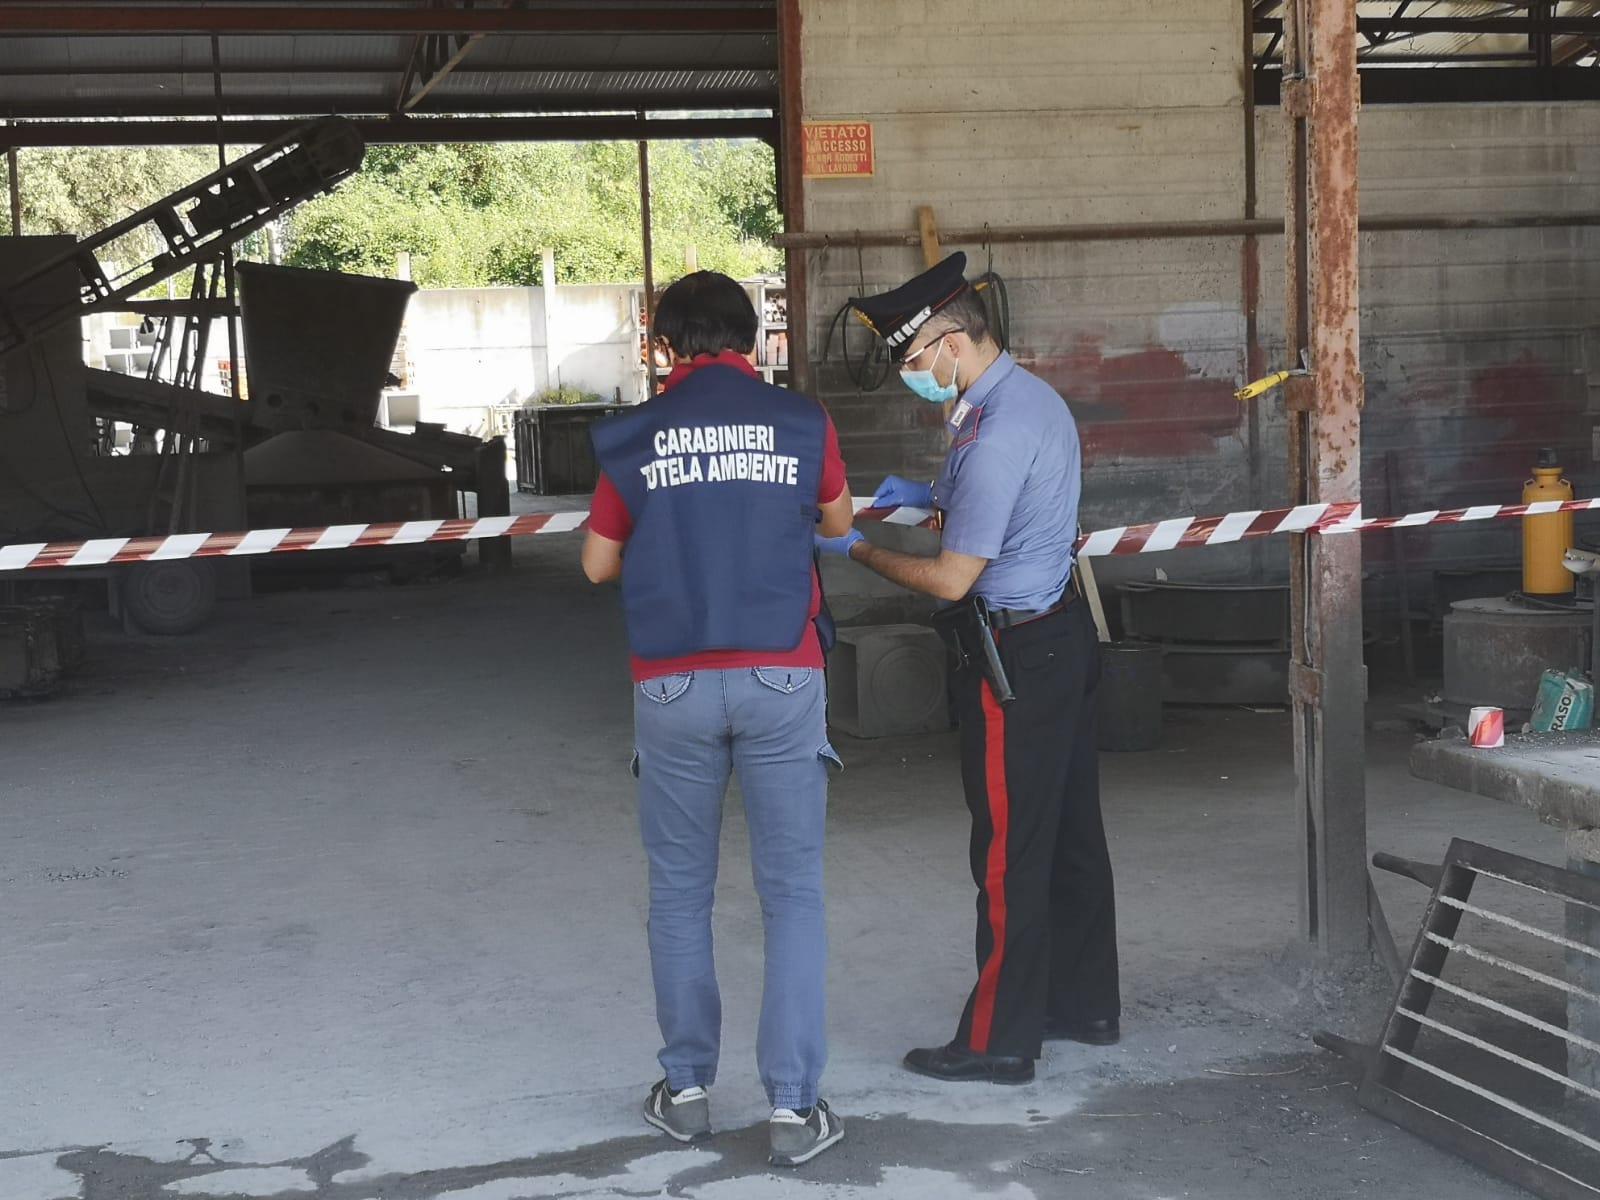 Reati ambientali, denunciati due imprenditori e sequestrati gli impianti di produzione